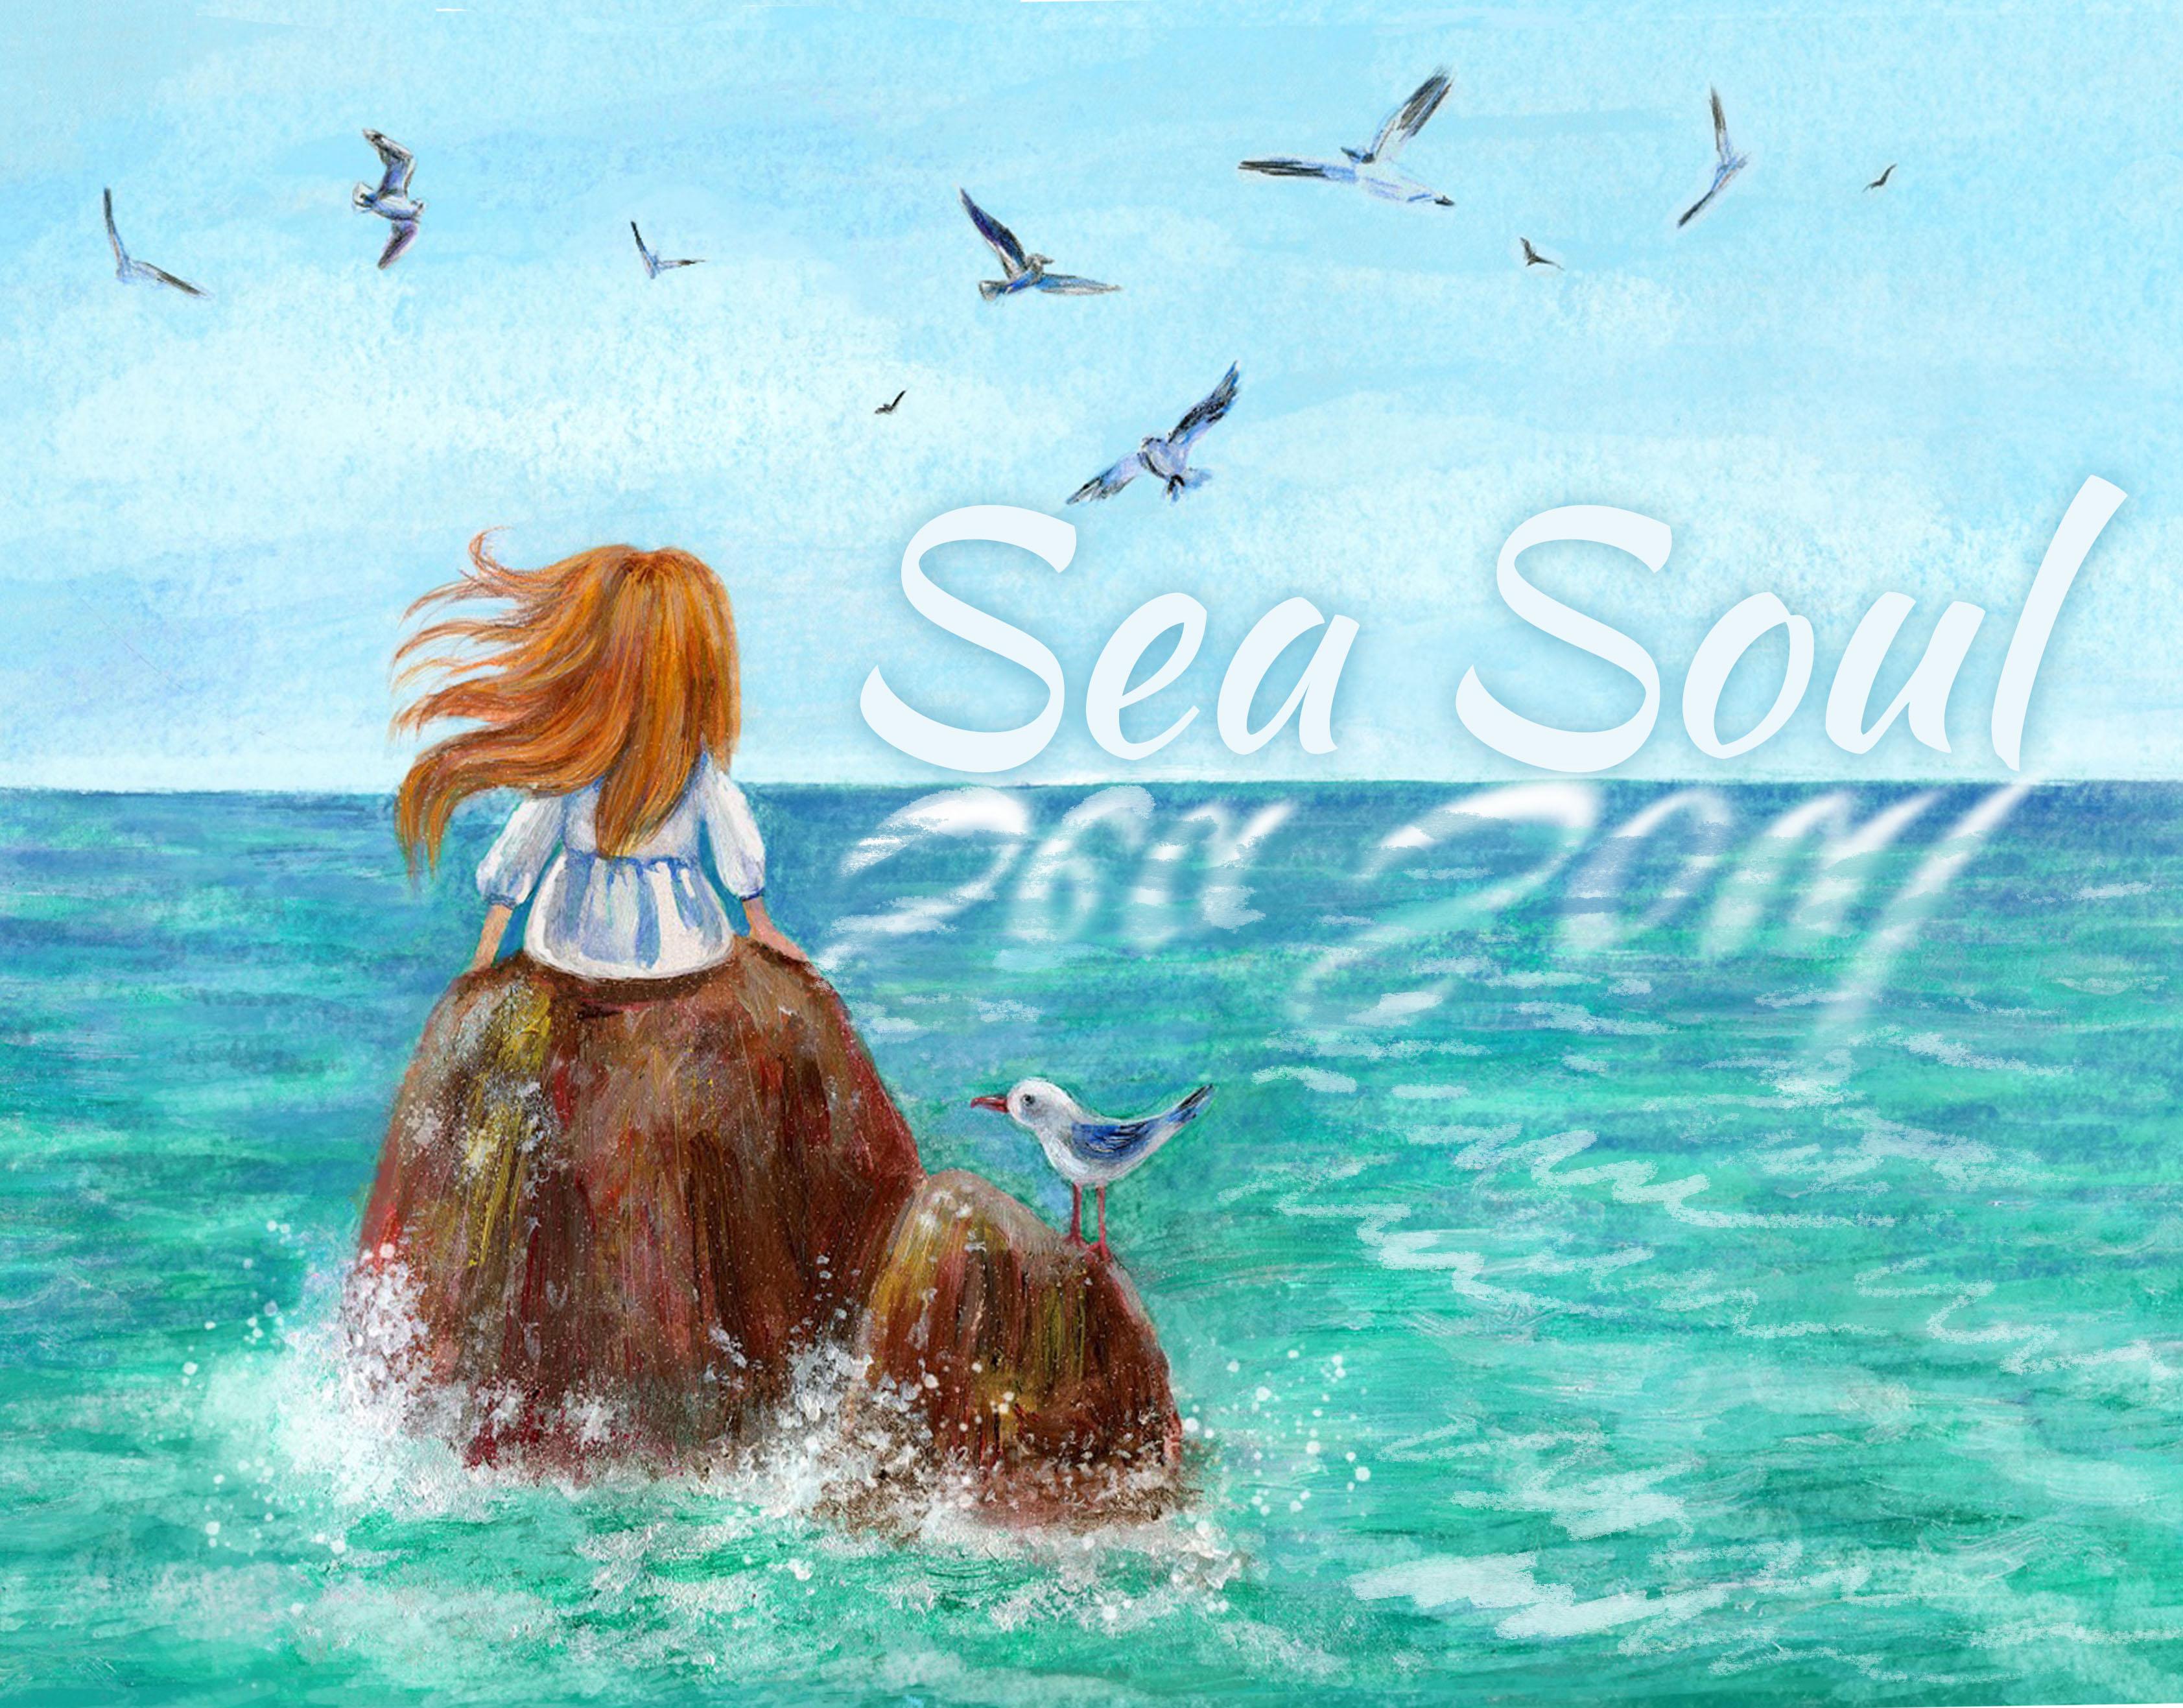 sea soul behance cover-4